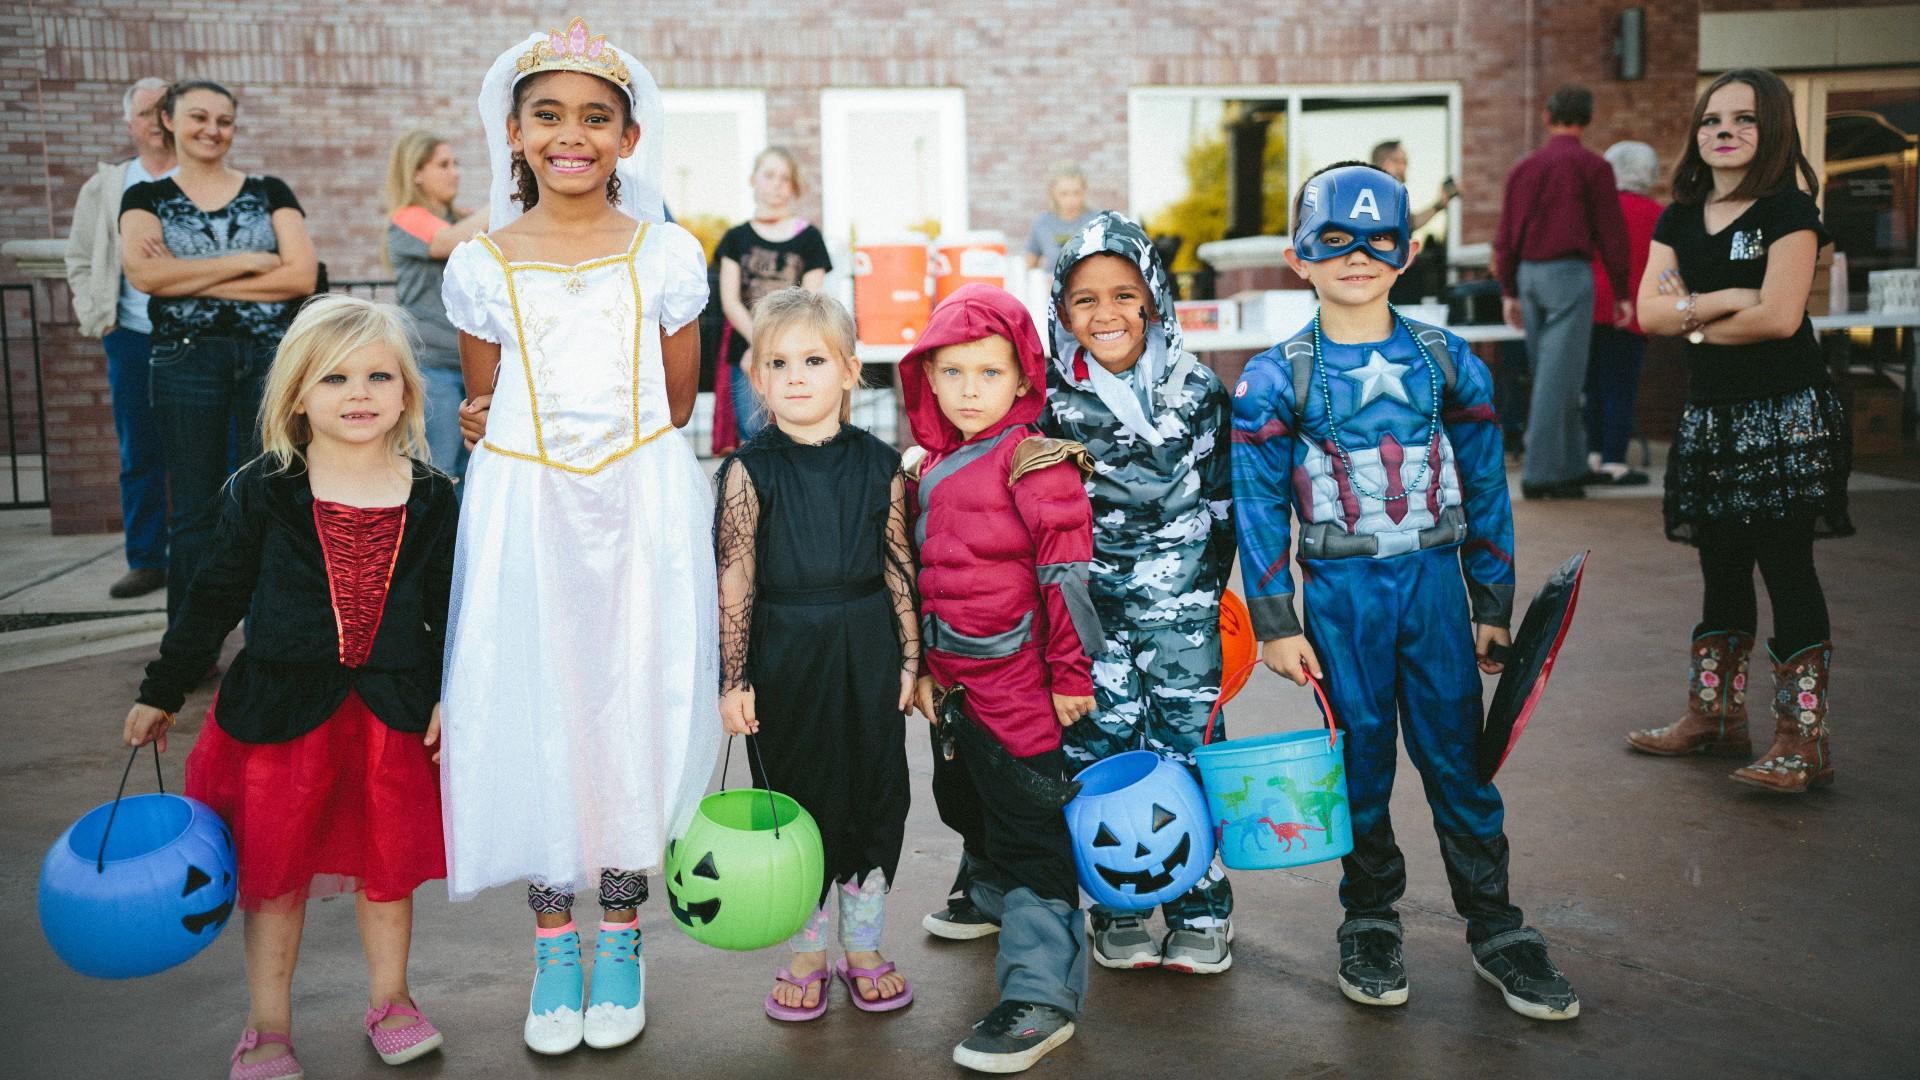 Jelmezbe öltözött gyerekek halloweenkor